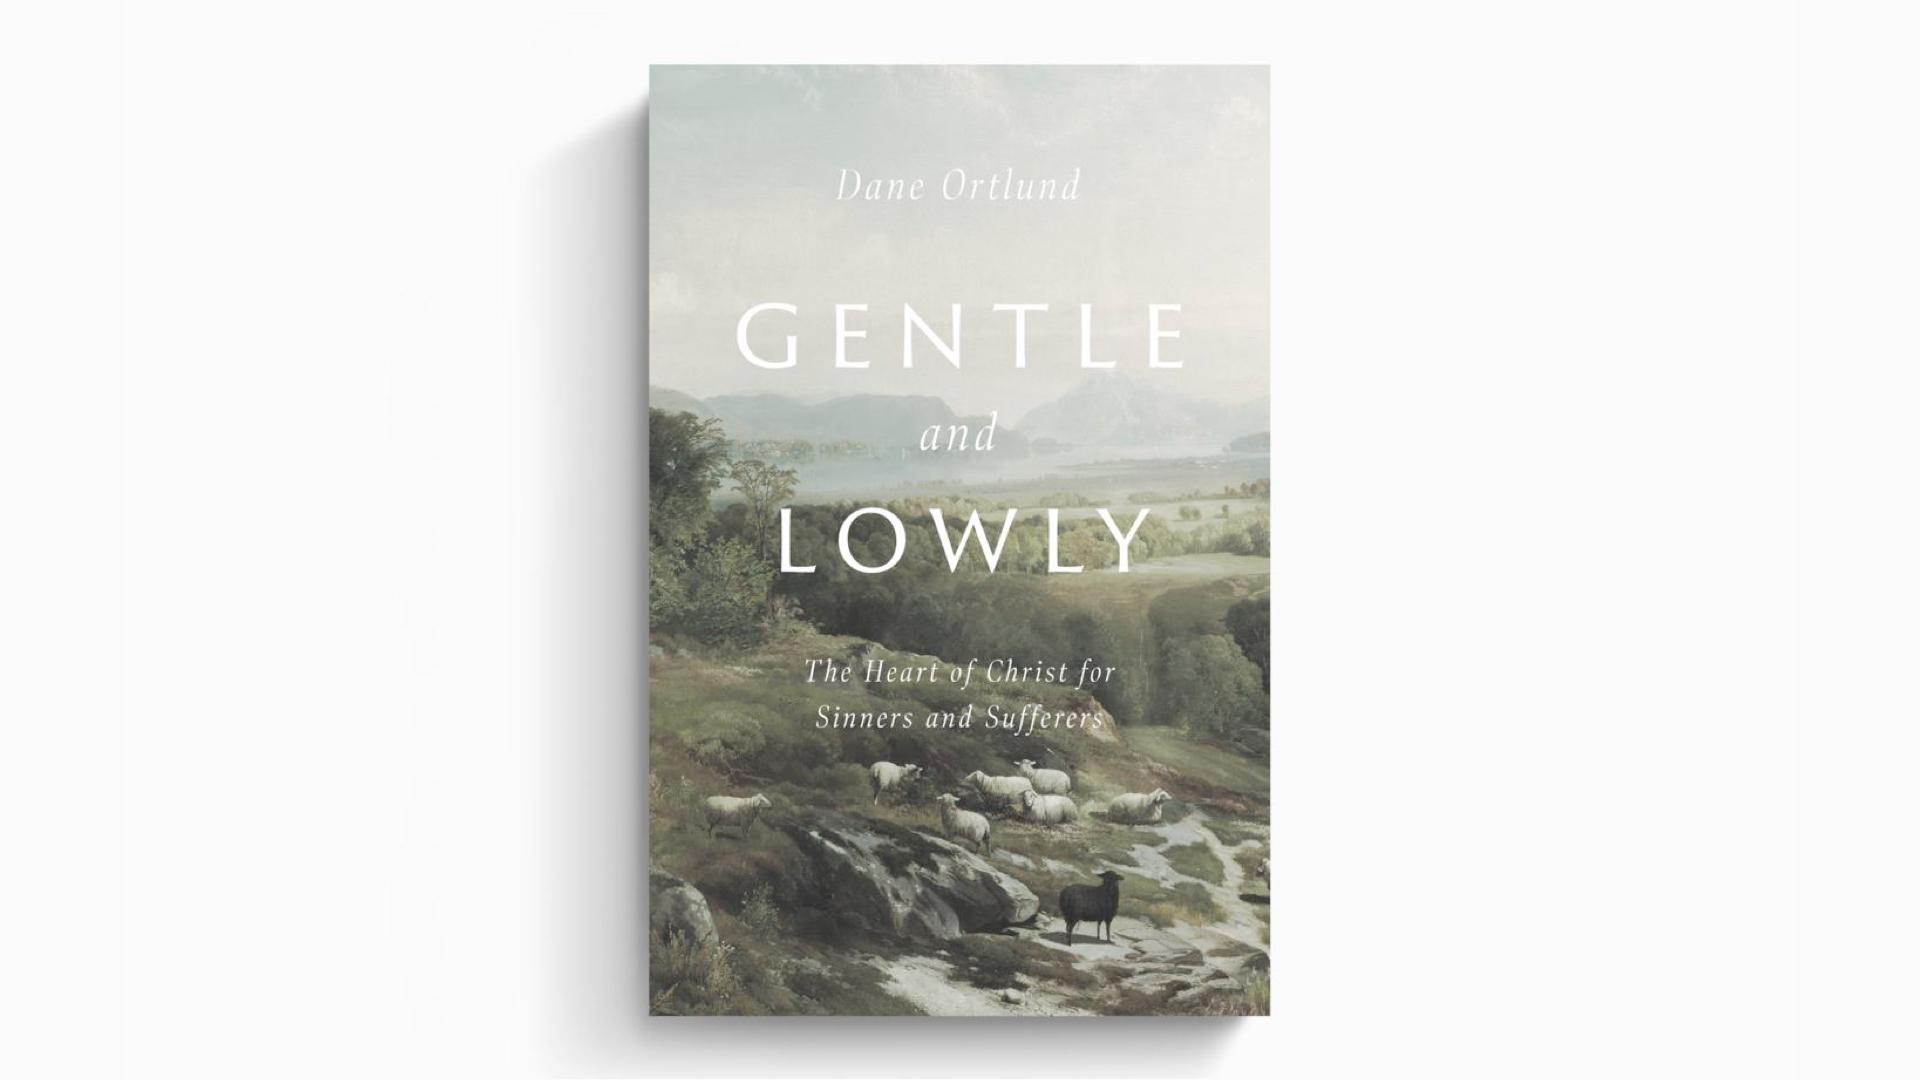 201123 Gentle & Lowly.001